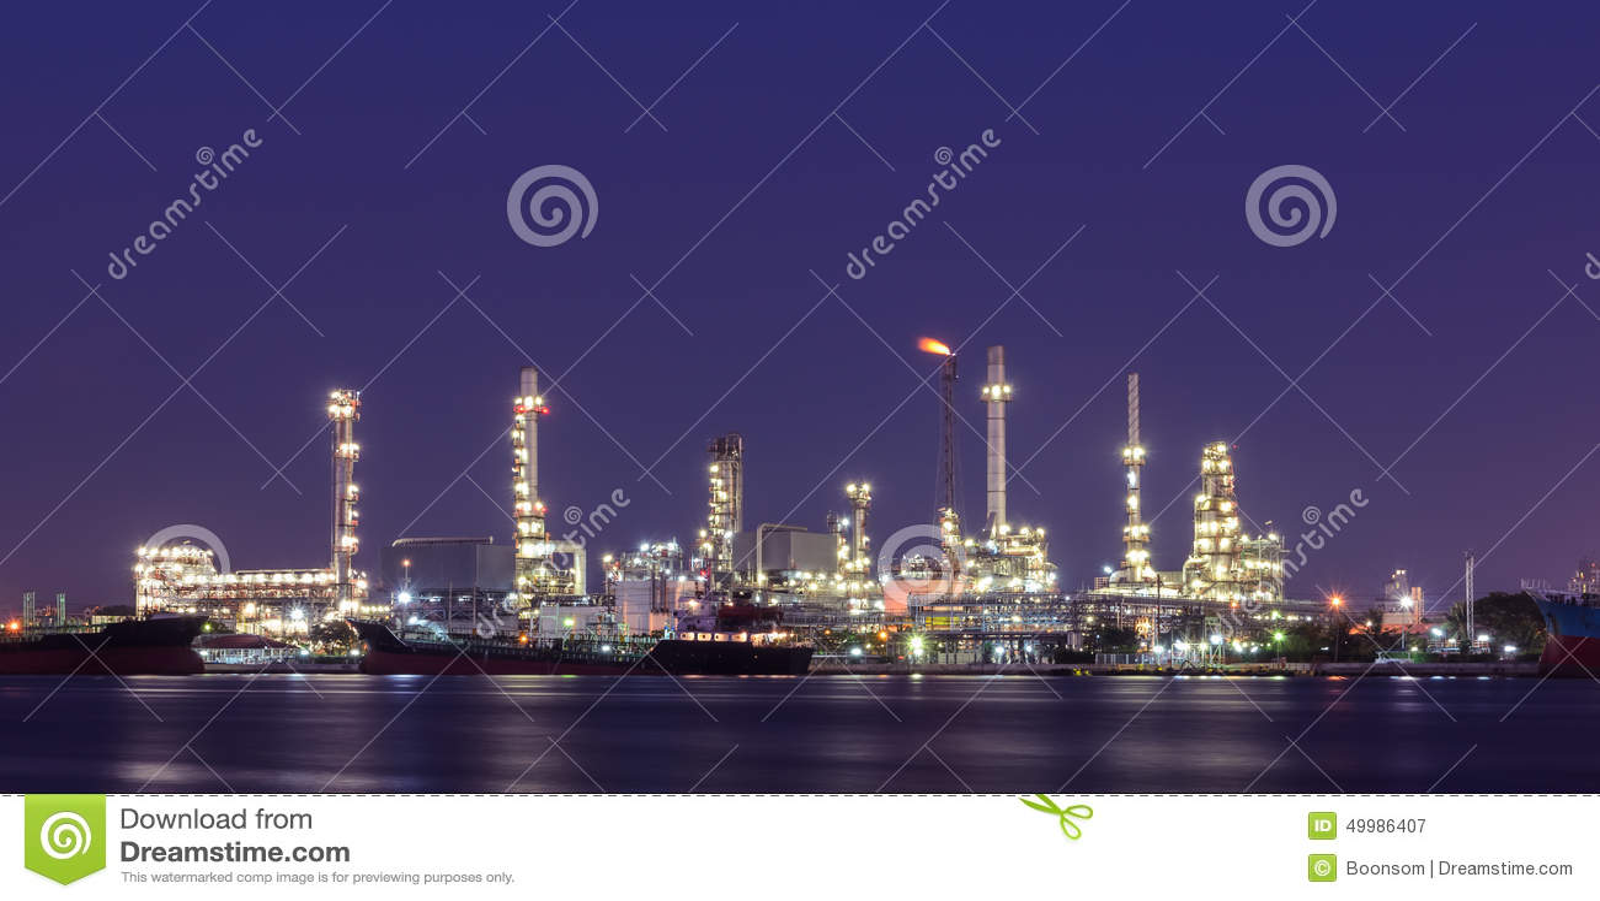 night-view-oil-refinery-plant-illuminate